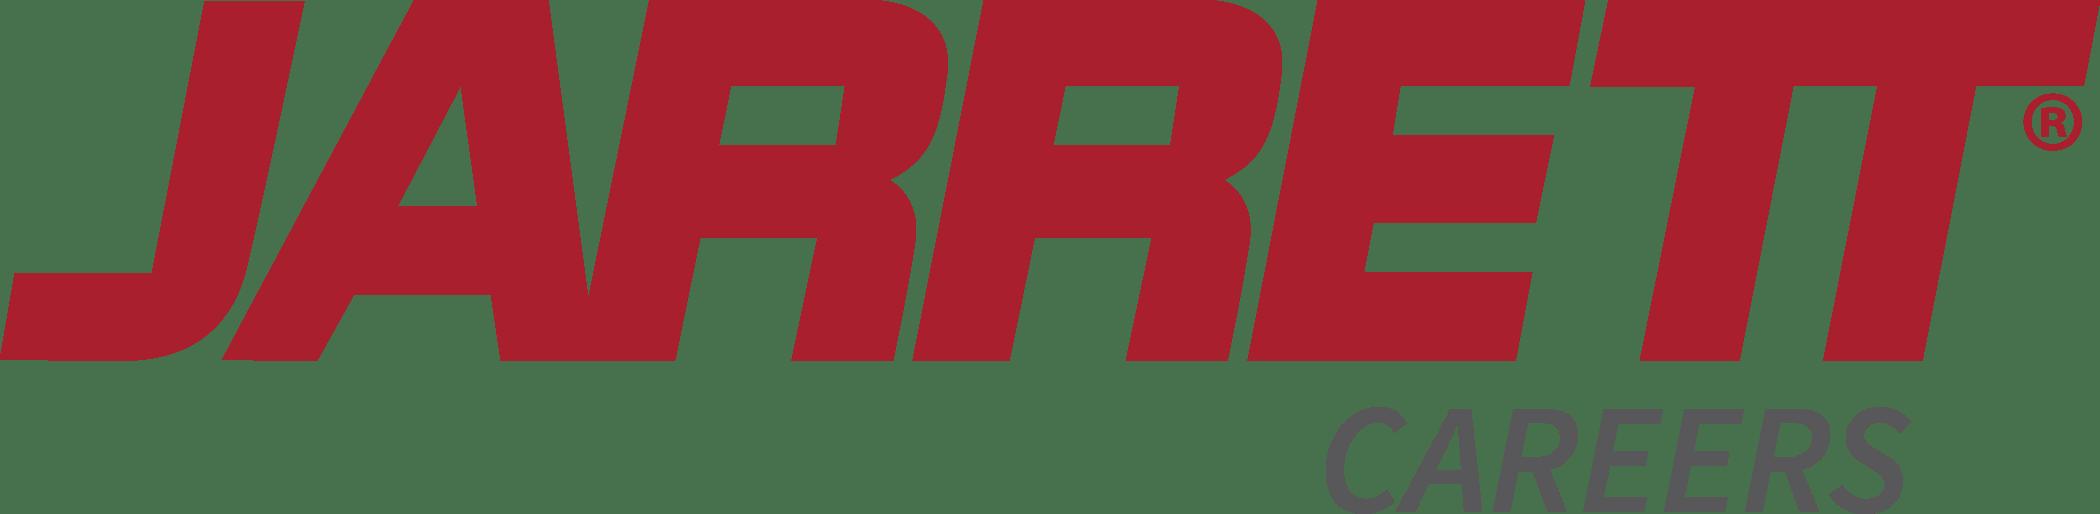 Jarrett Careers Logo